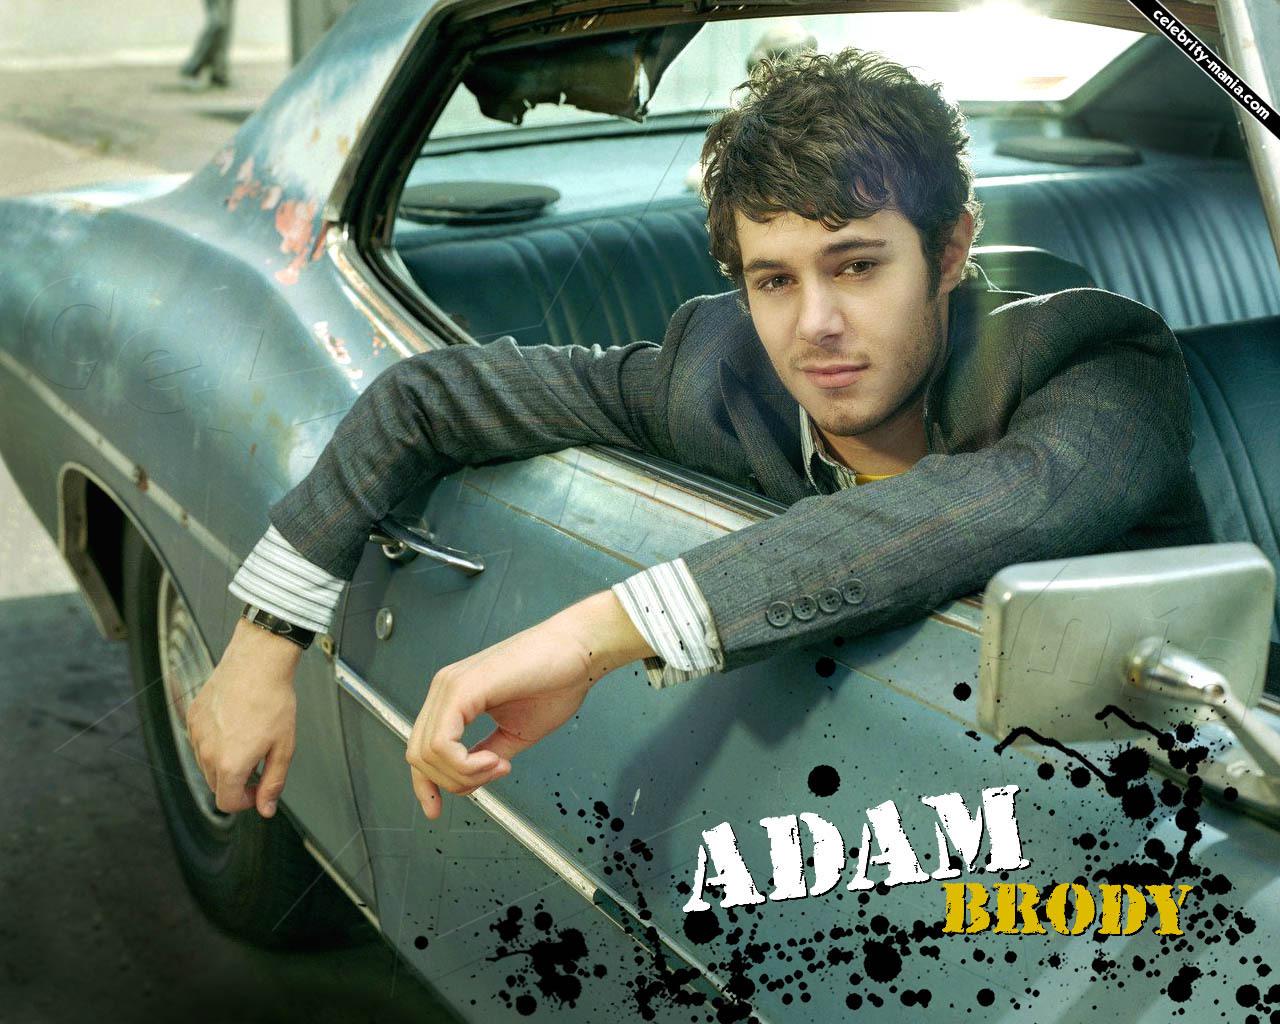 https://2.bp.blogspot.com/-fPiW3NHC9lA/TzKdP6i-N_I/AAAAAAAABVQ/RuGLfVD3px8/s1600/adam-brody-background-5-719820.jpg